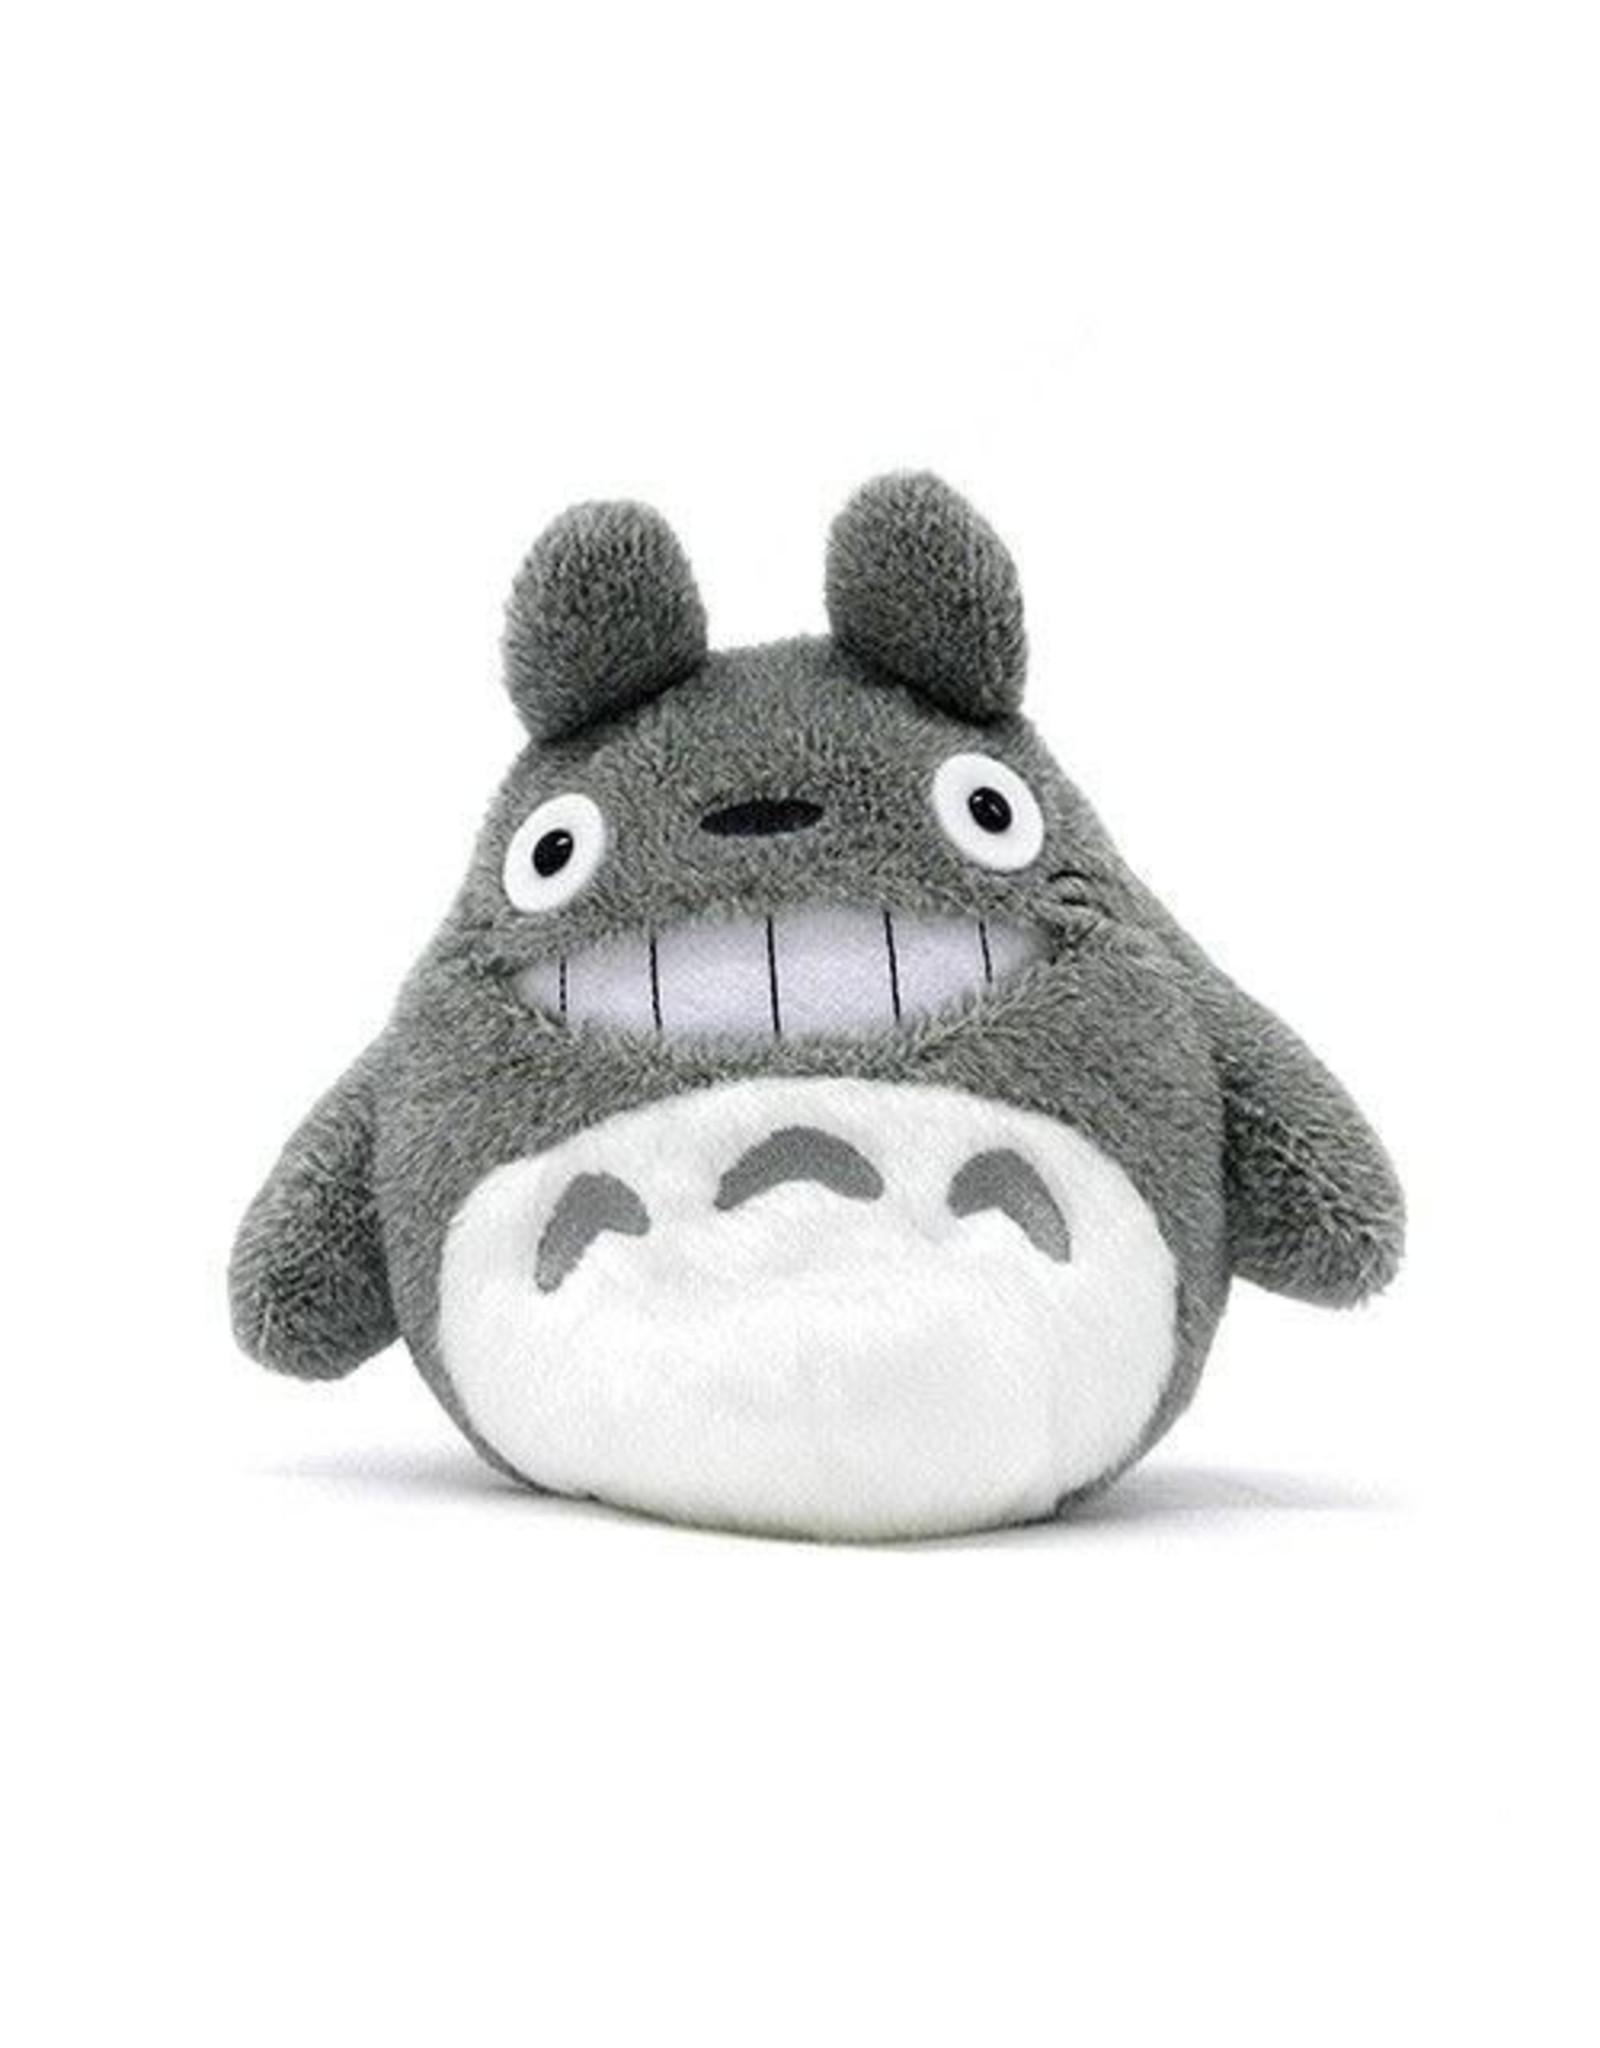 Studio Ghibli Plush - My Neighbor Totoro - Totoro Smile - 18 cm